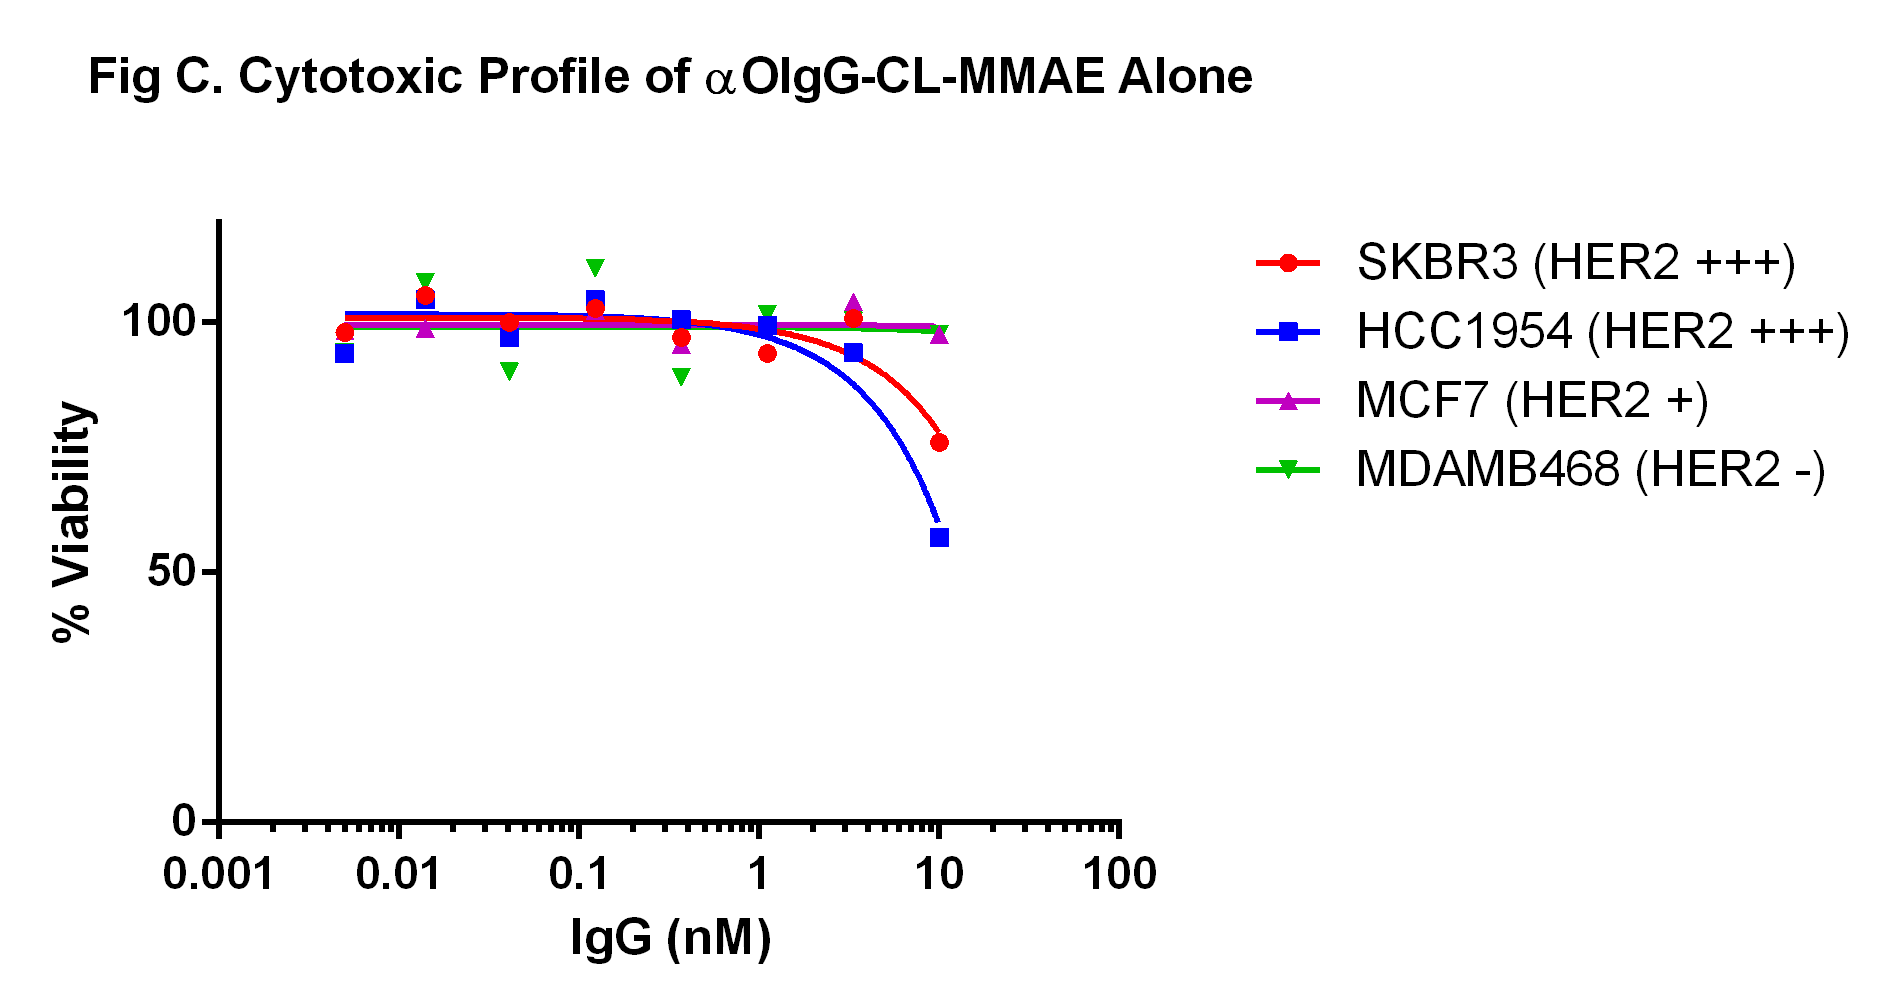 Moradec - ADC Directory Member - Antibody-drug Conjugates